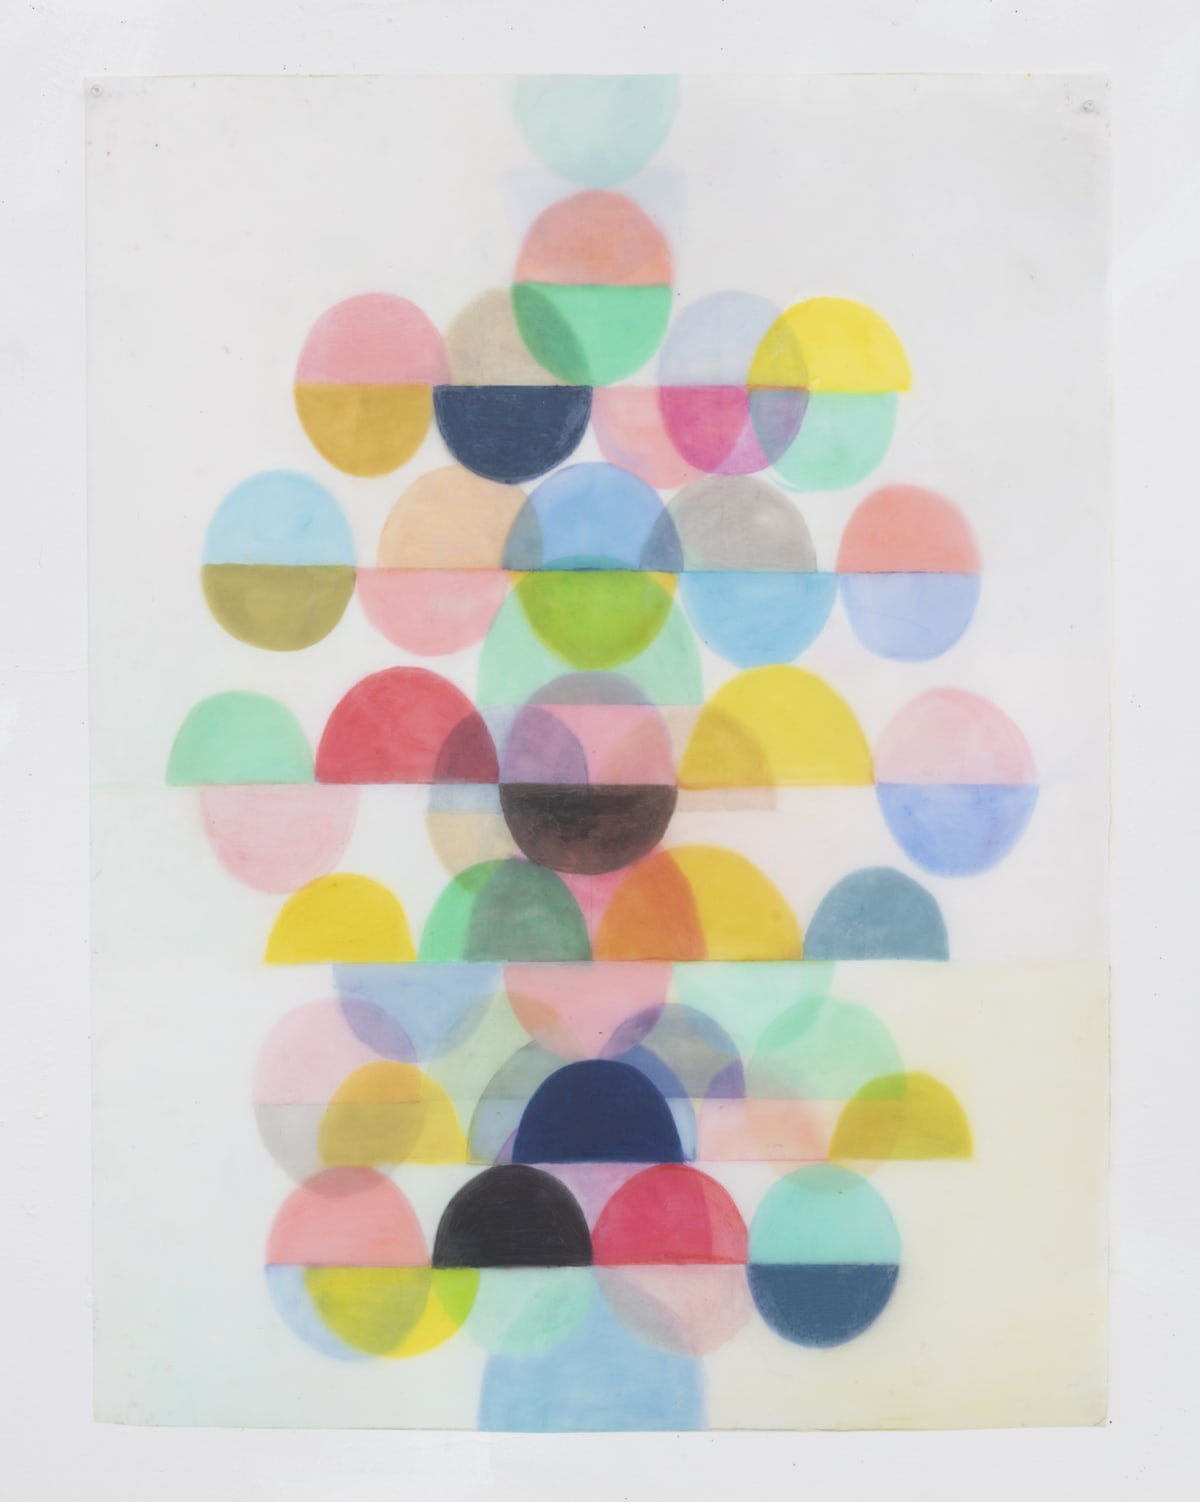 Vicki Sher, Untitled 2, 2019